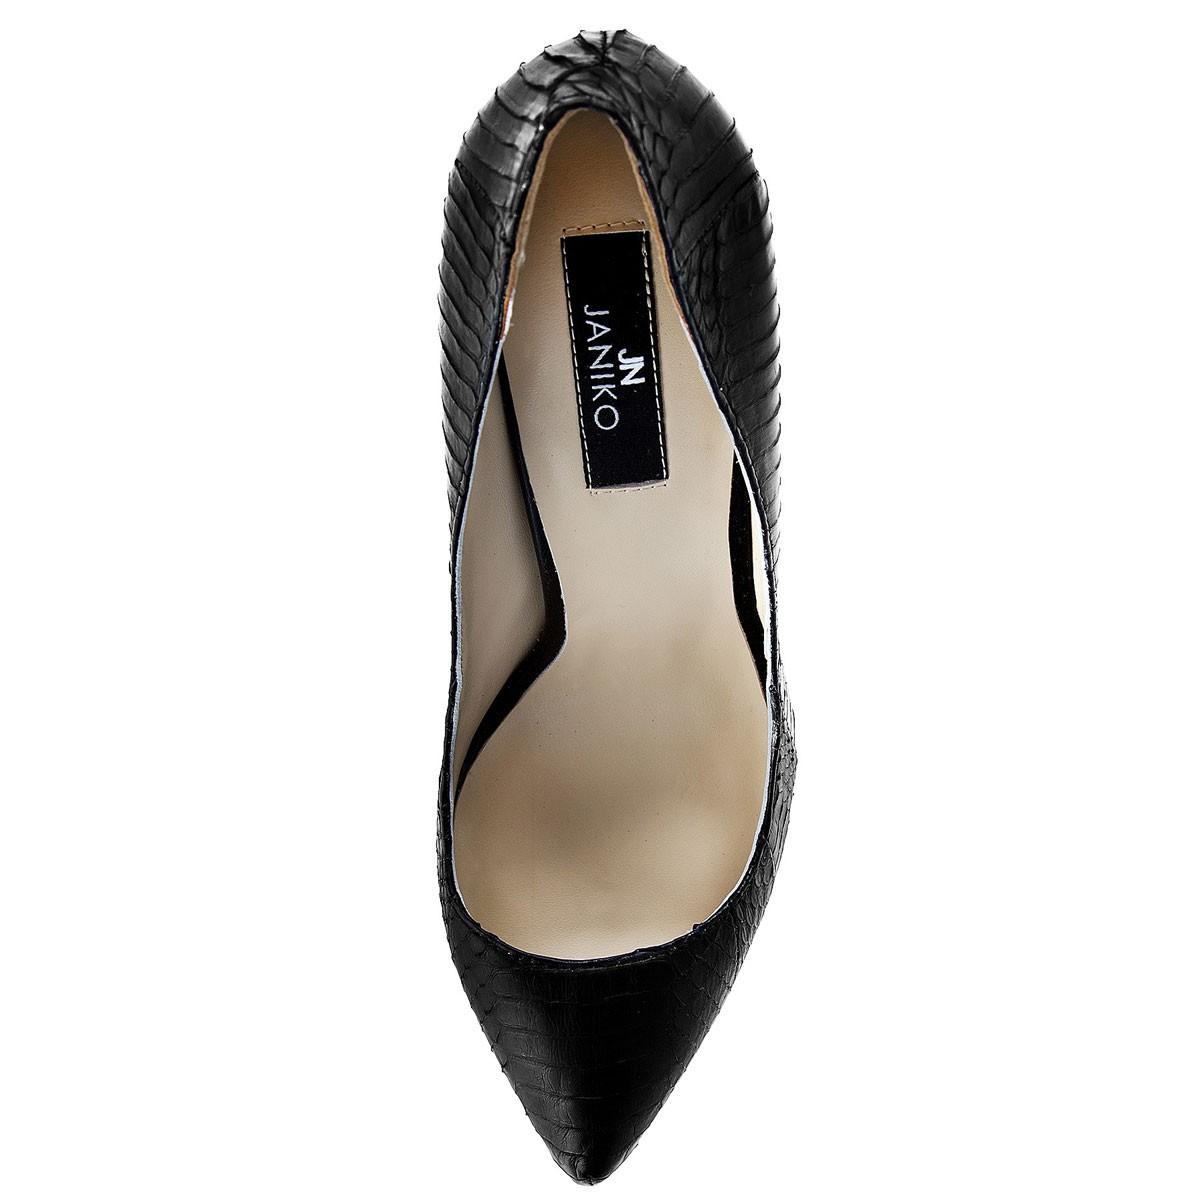 Janiko Women high heels Black MARABOU XB1016